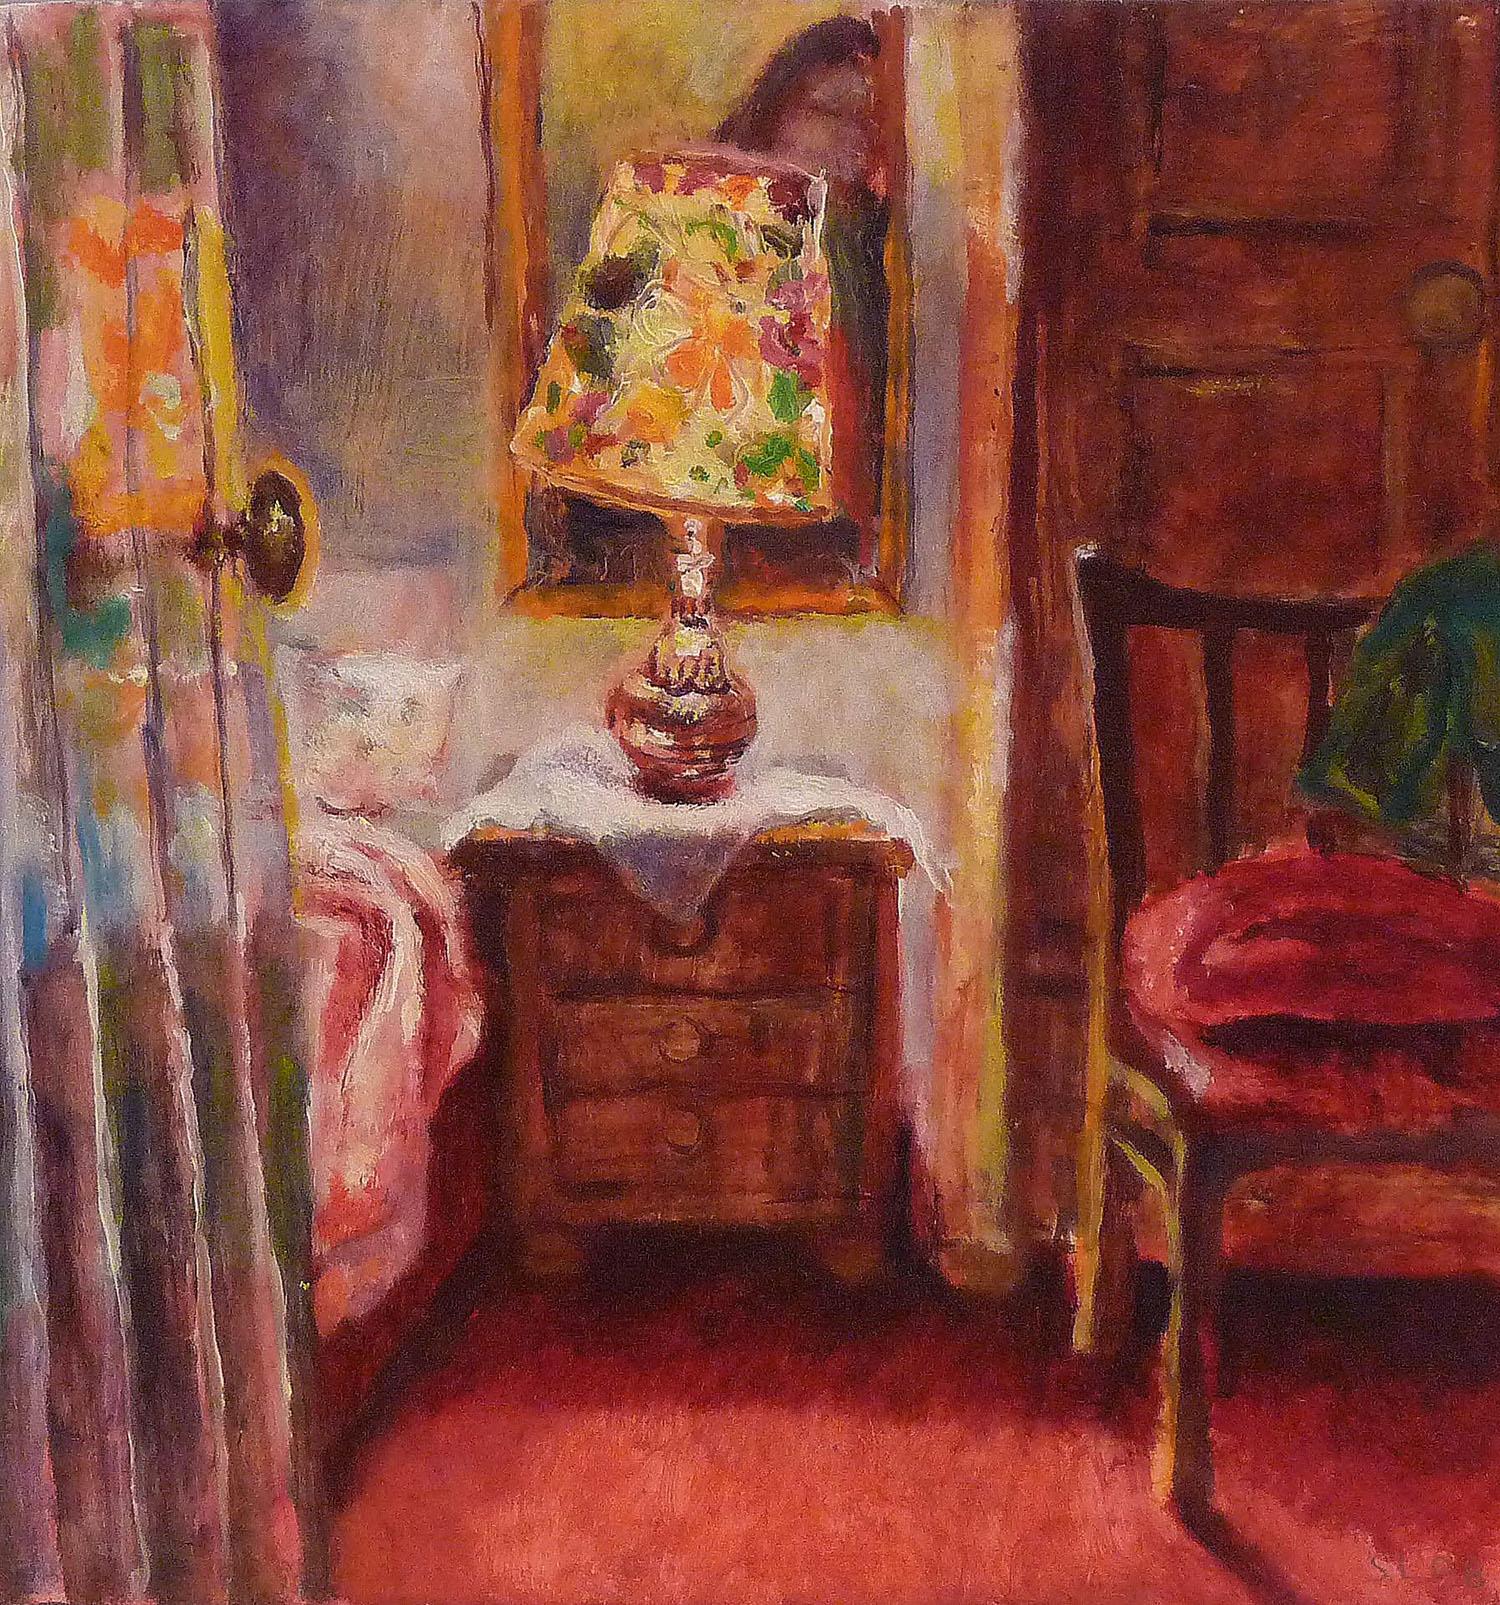 Sarah Longley_-_Back Bedroom, Arran_oil on board_29 x 29cm.jpg